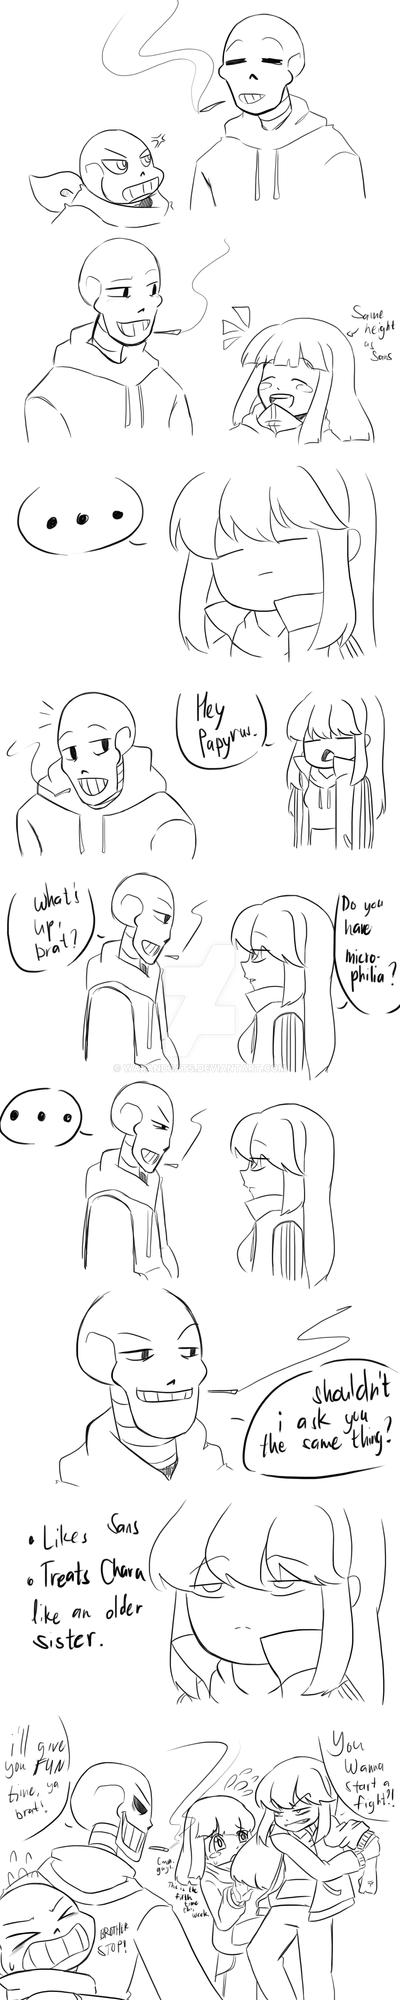 Mortal enemies yet same tastes by WarandCats